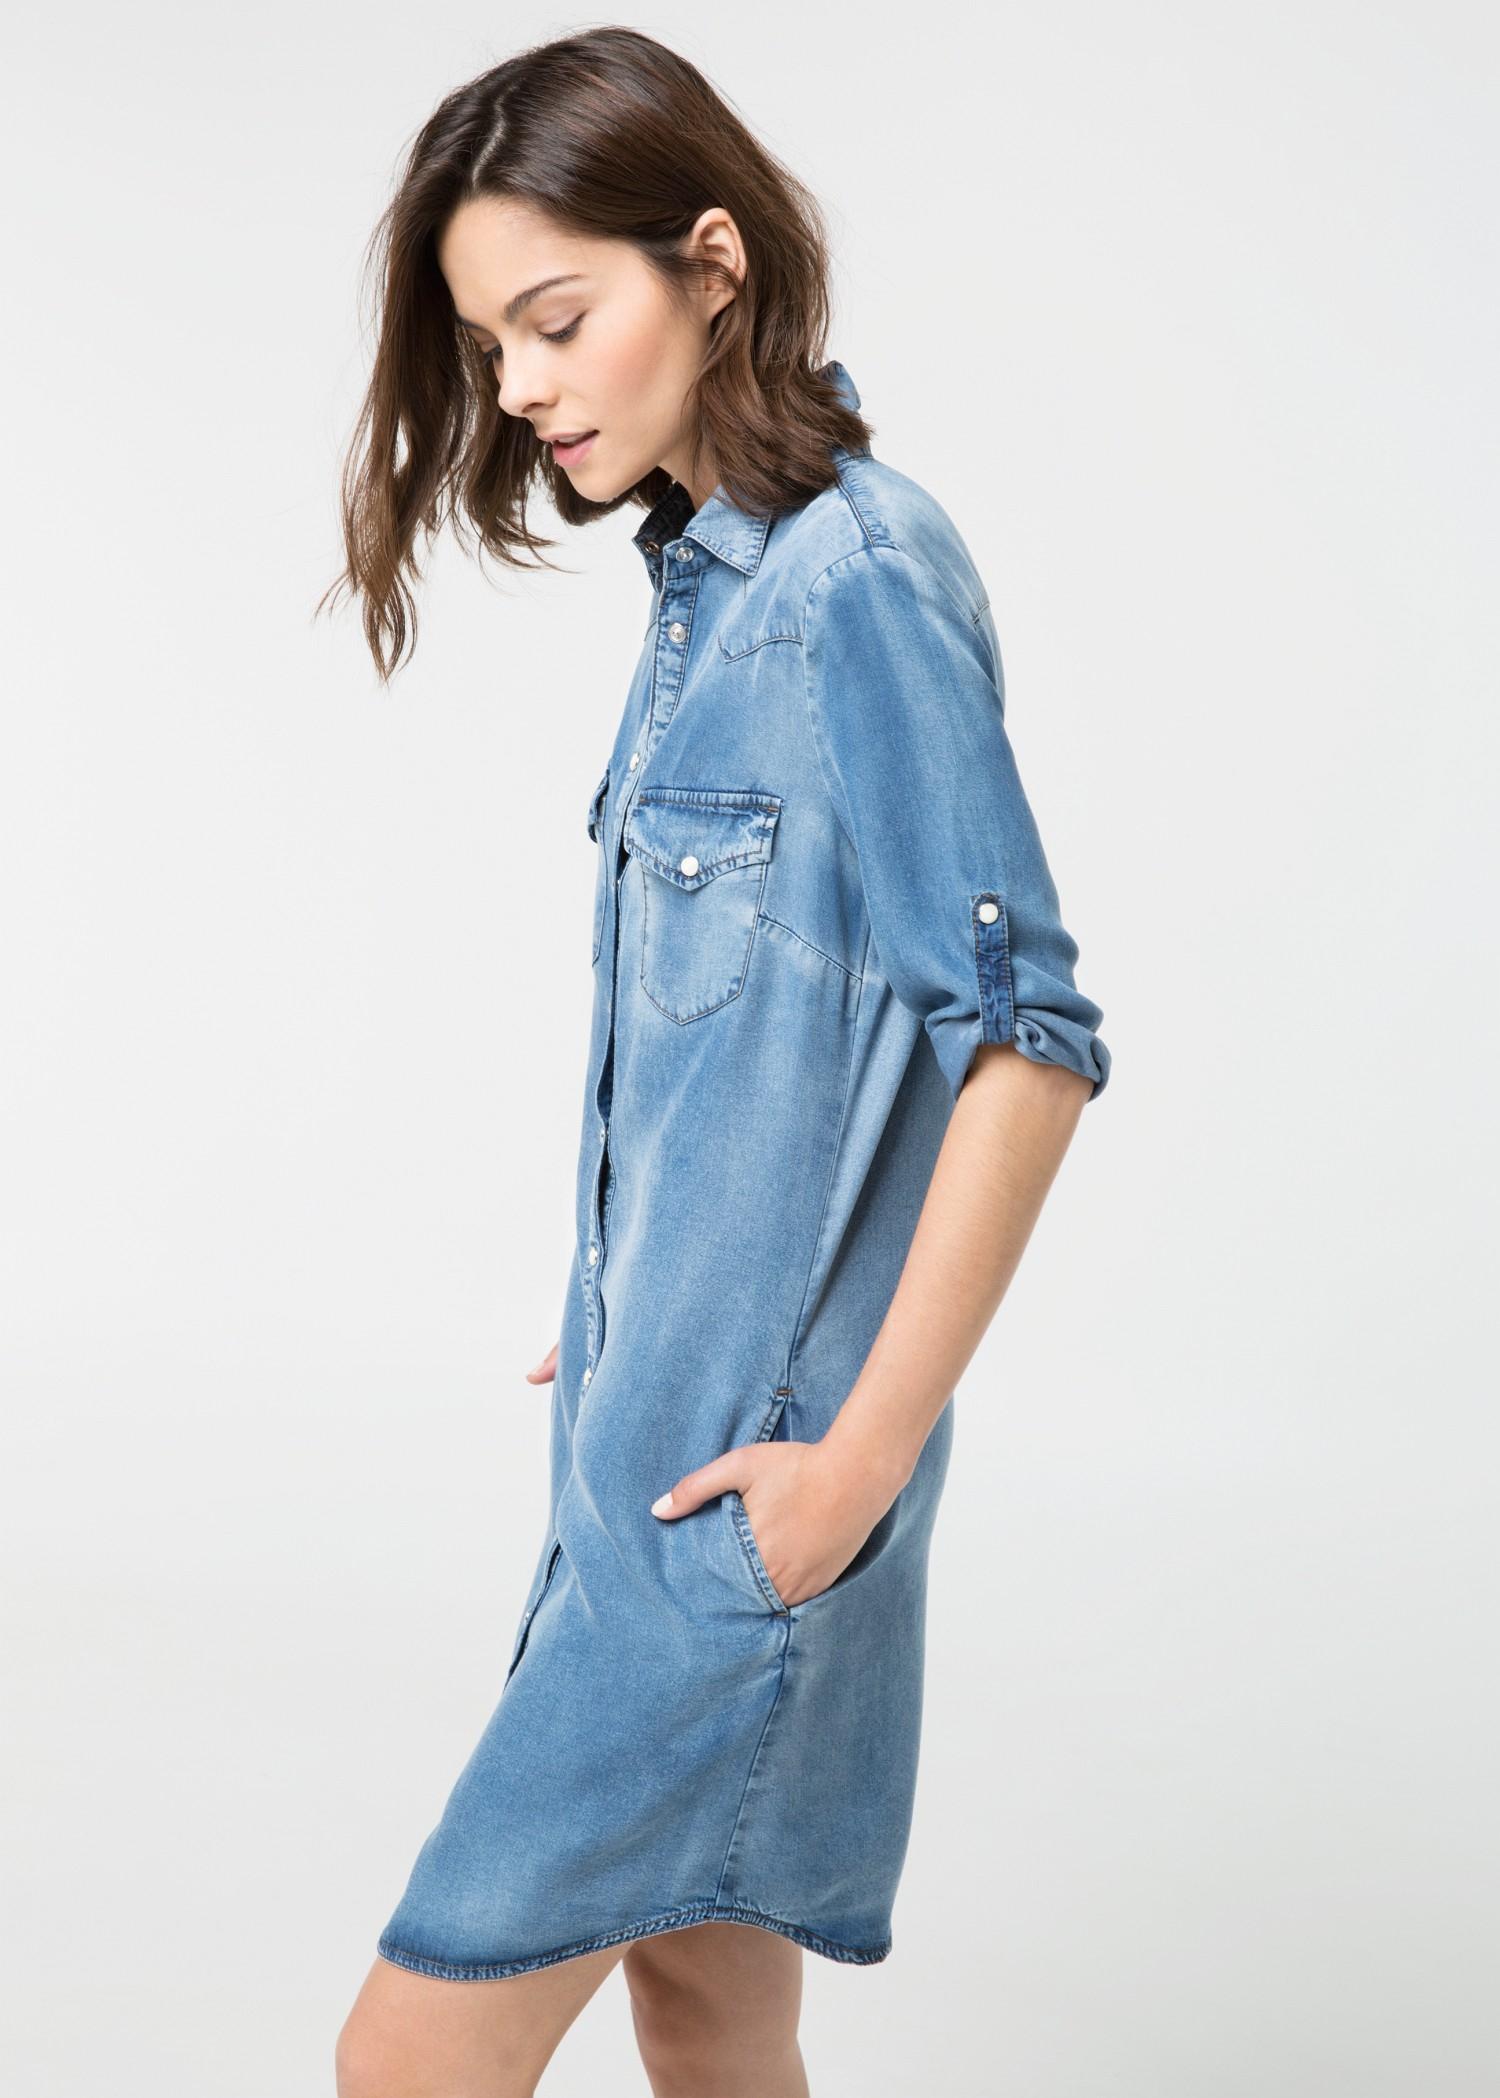 Stetson Womens Jeans